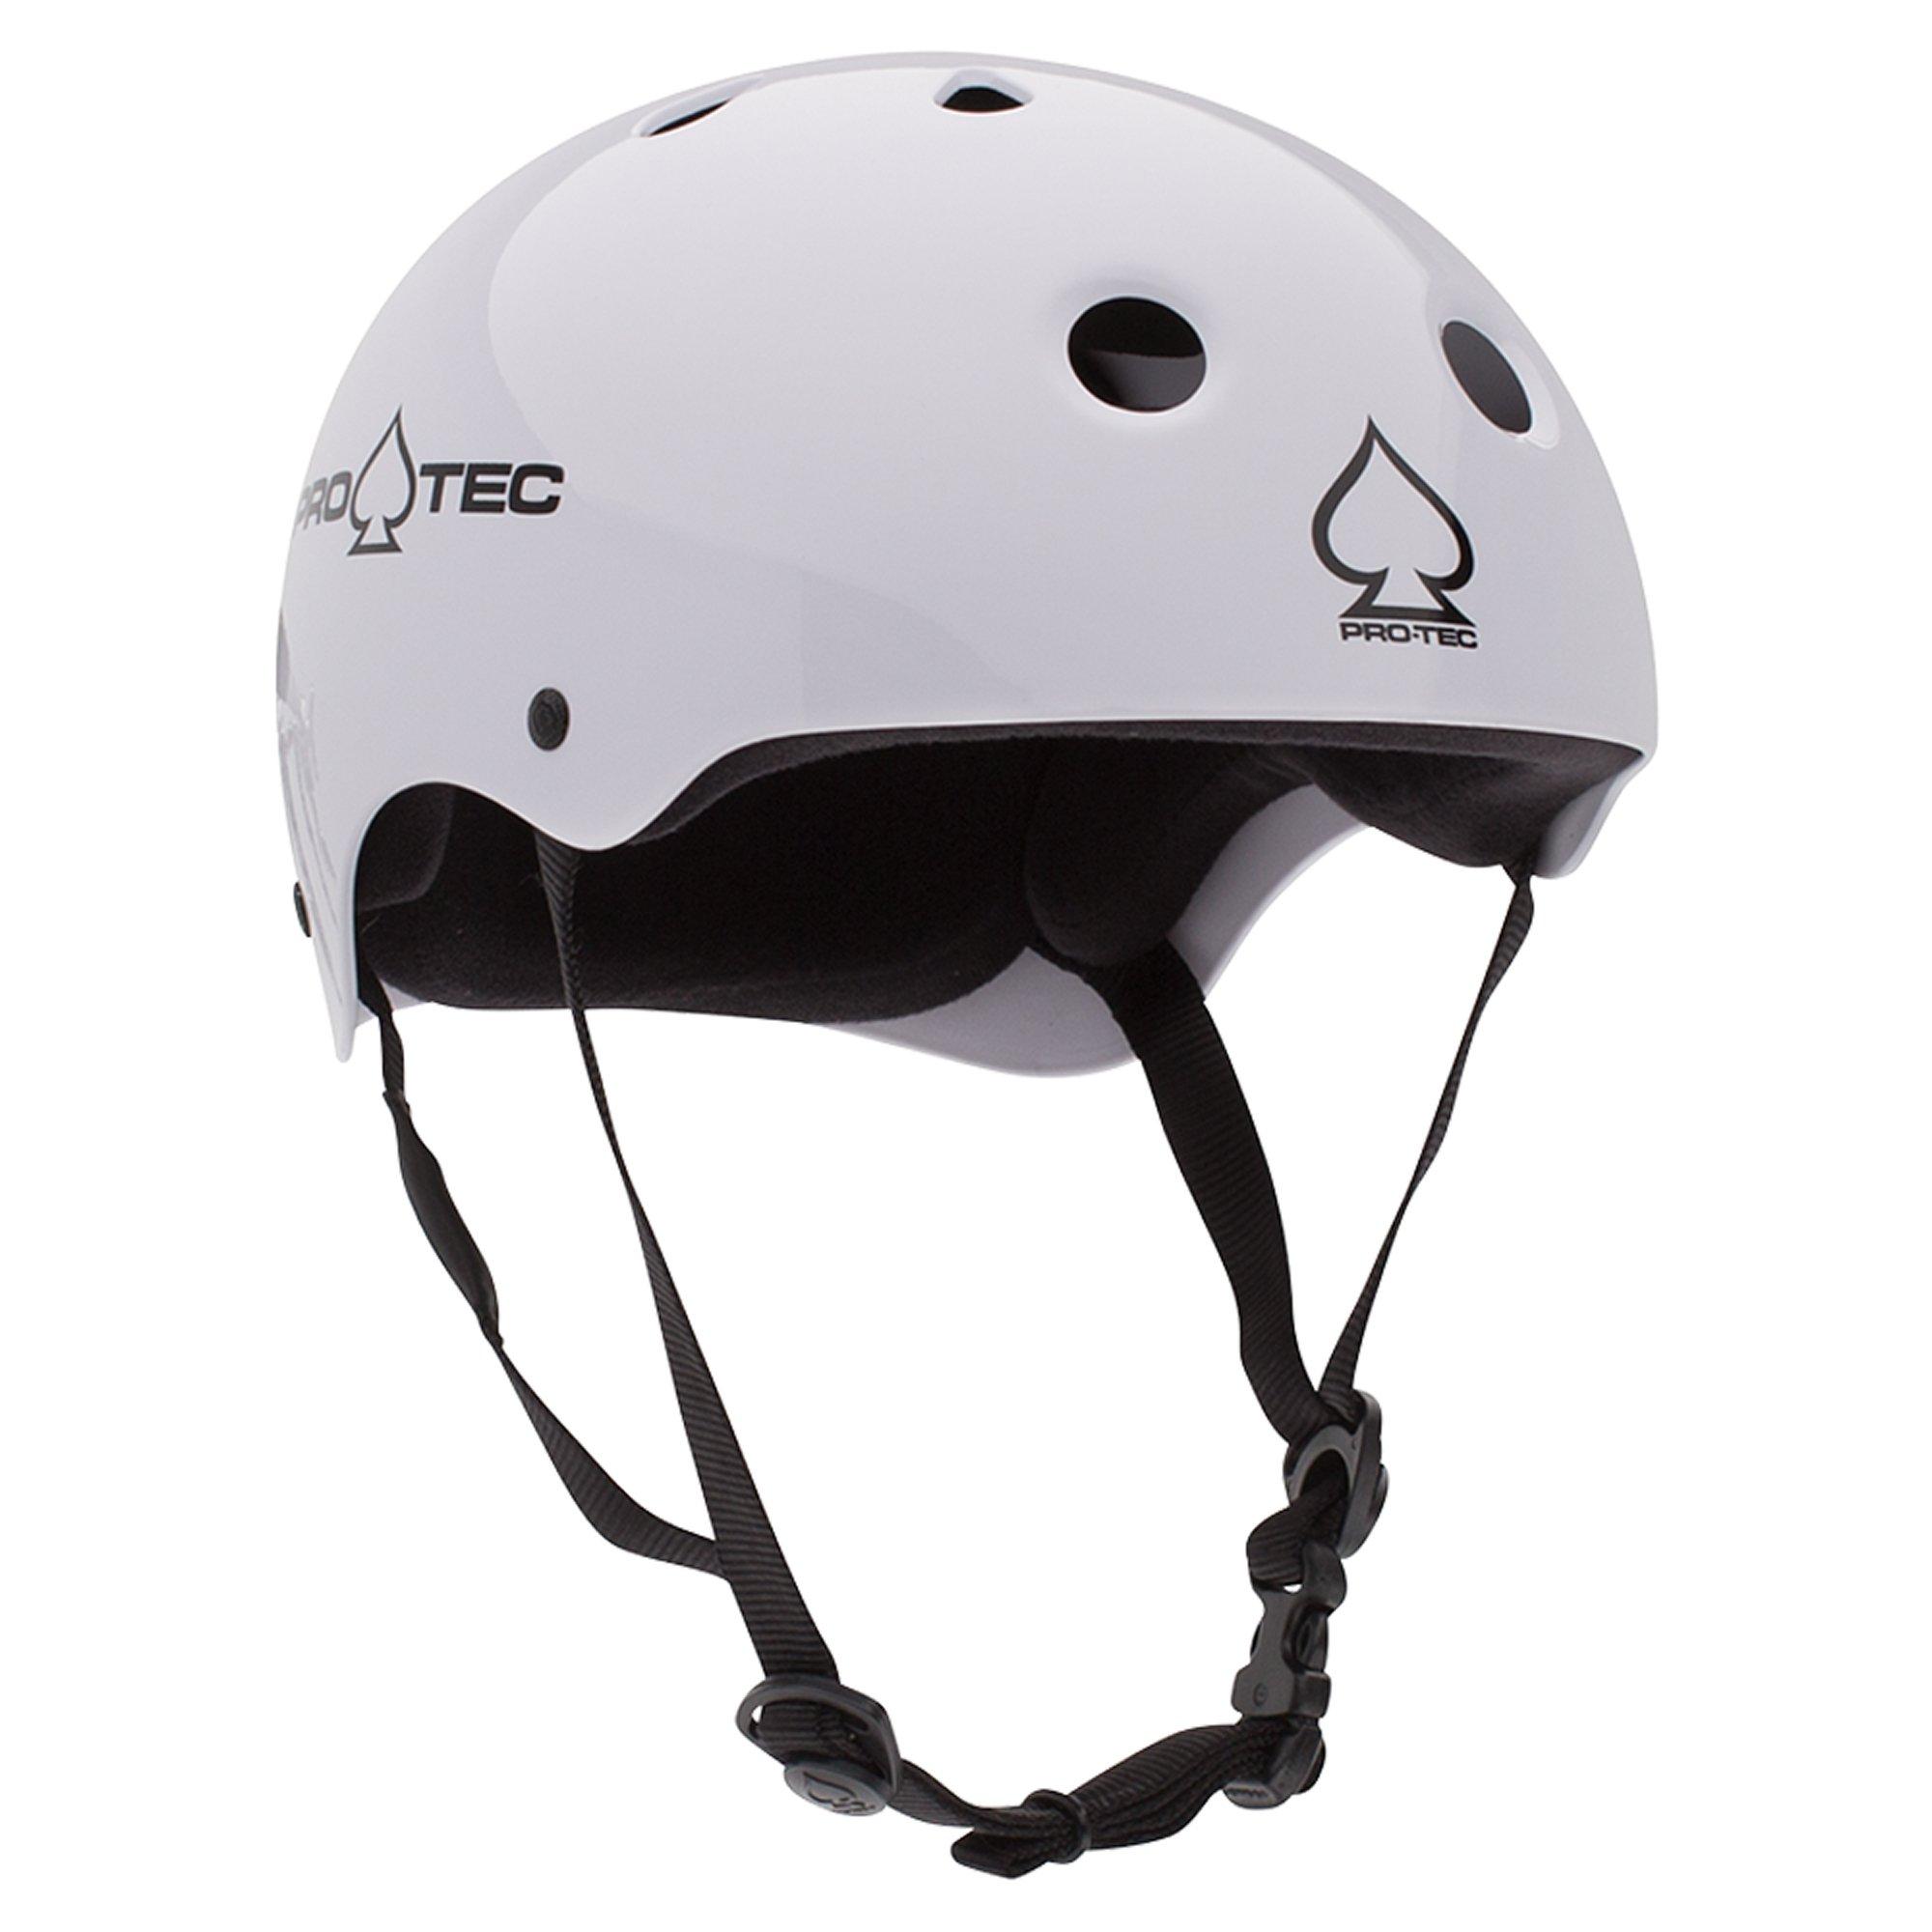 Pro-Tec Classic Skate Helmet, Gloss White, Medium